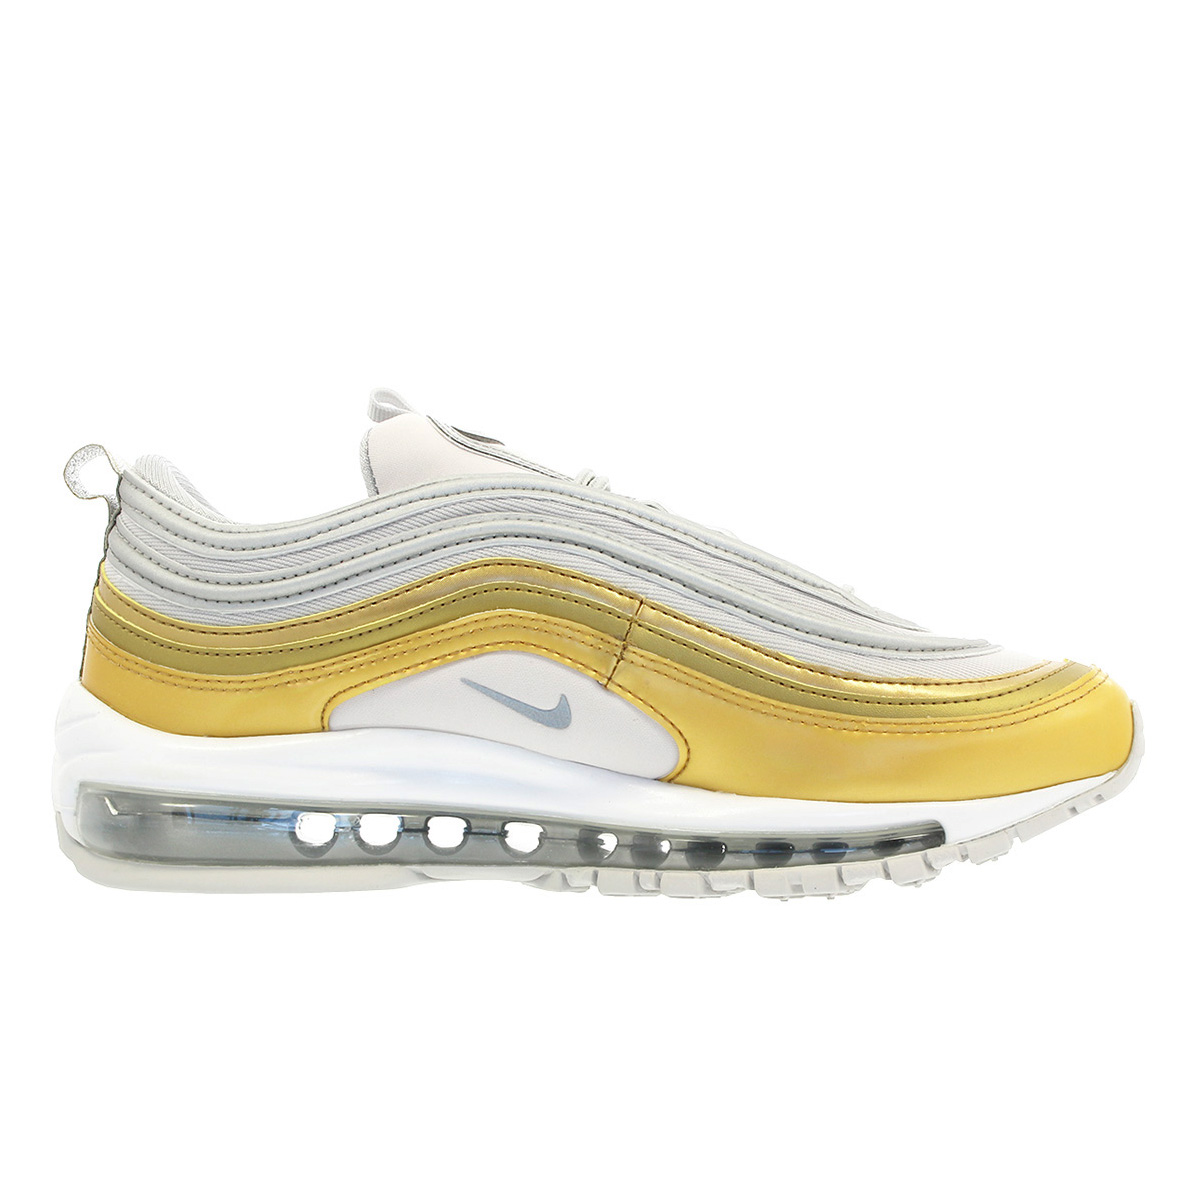 NIKE WMNS AIR MAX 97 SE Nike women Air Max 97 SE VAST GREYMETALLIC SILVERMETALLIC GOLD aq4137 001